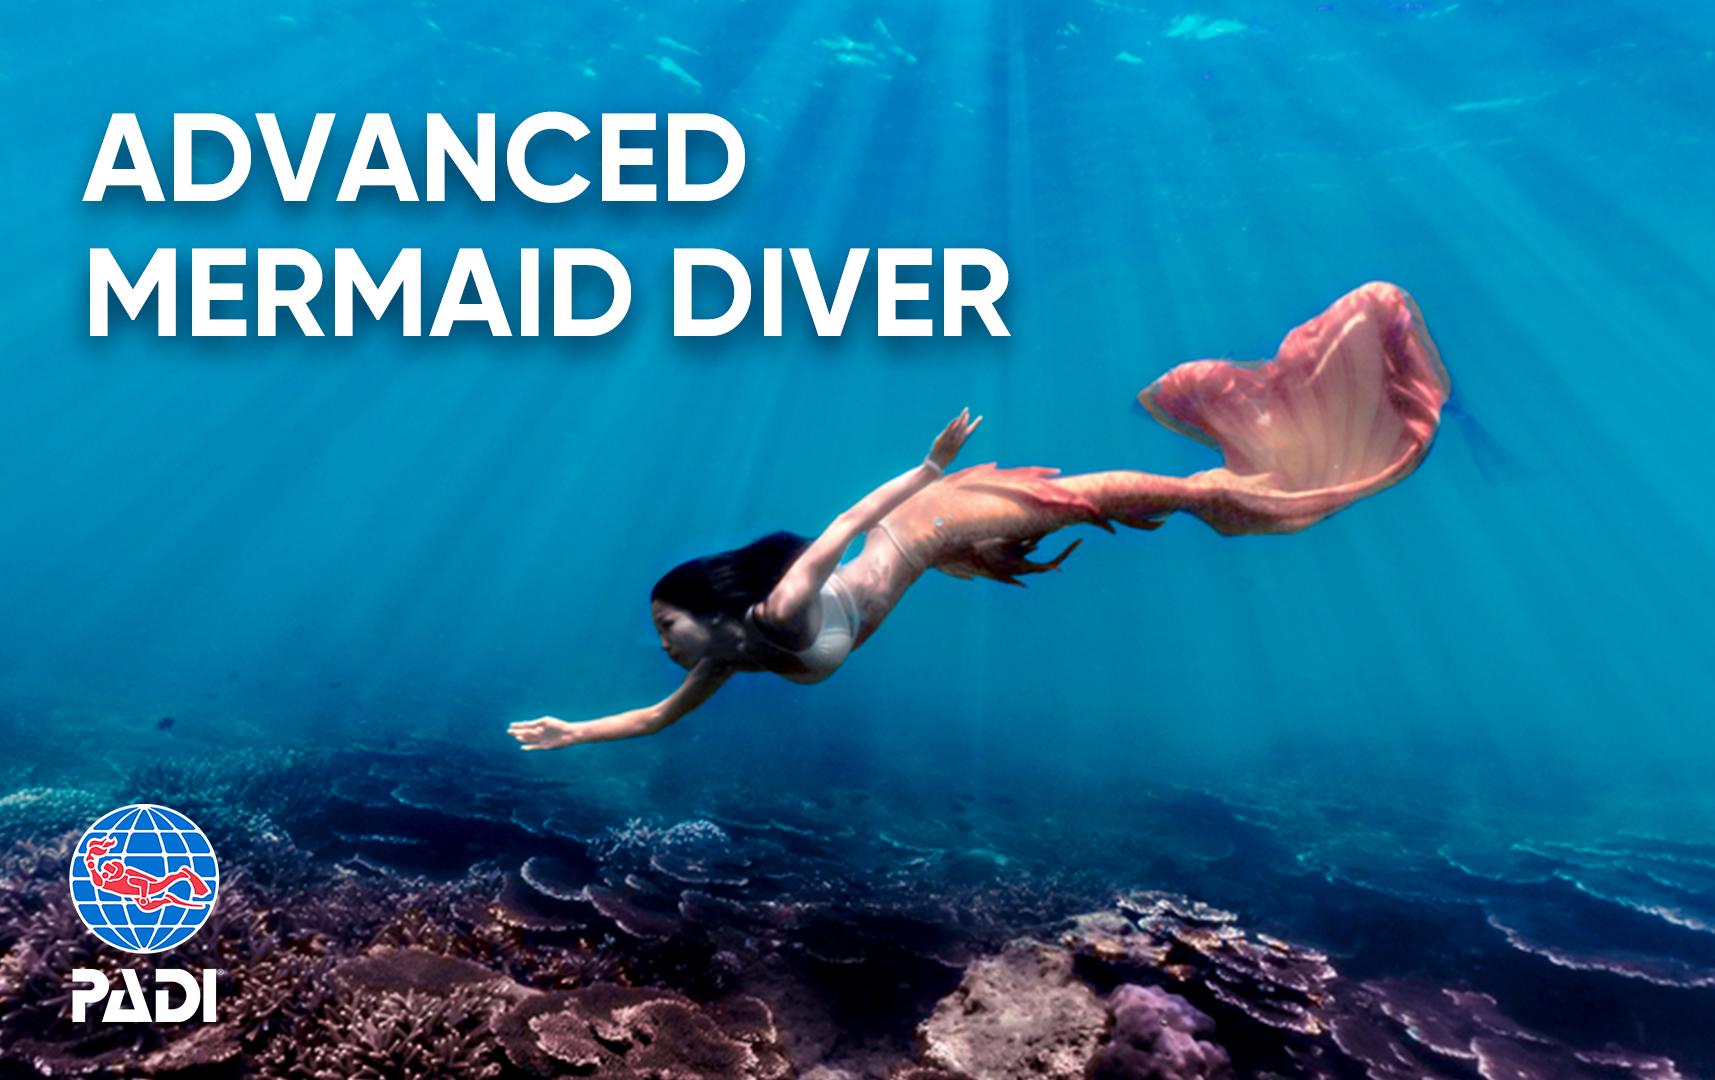 PADI Advanced Mermaid